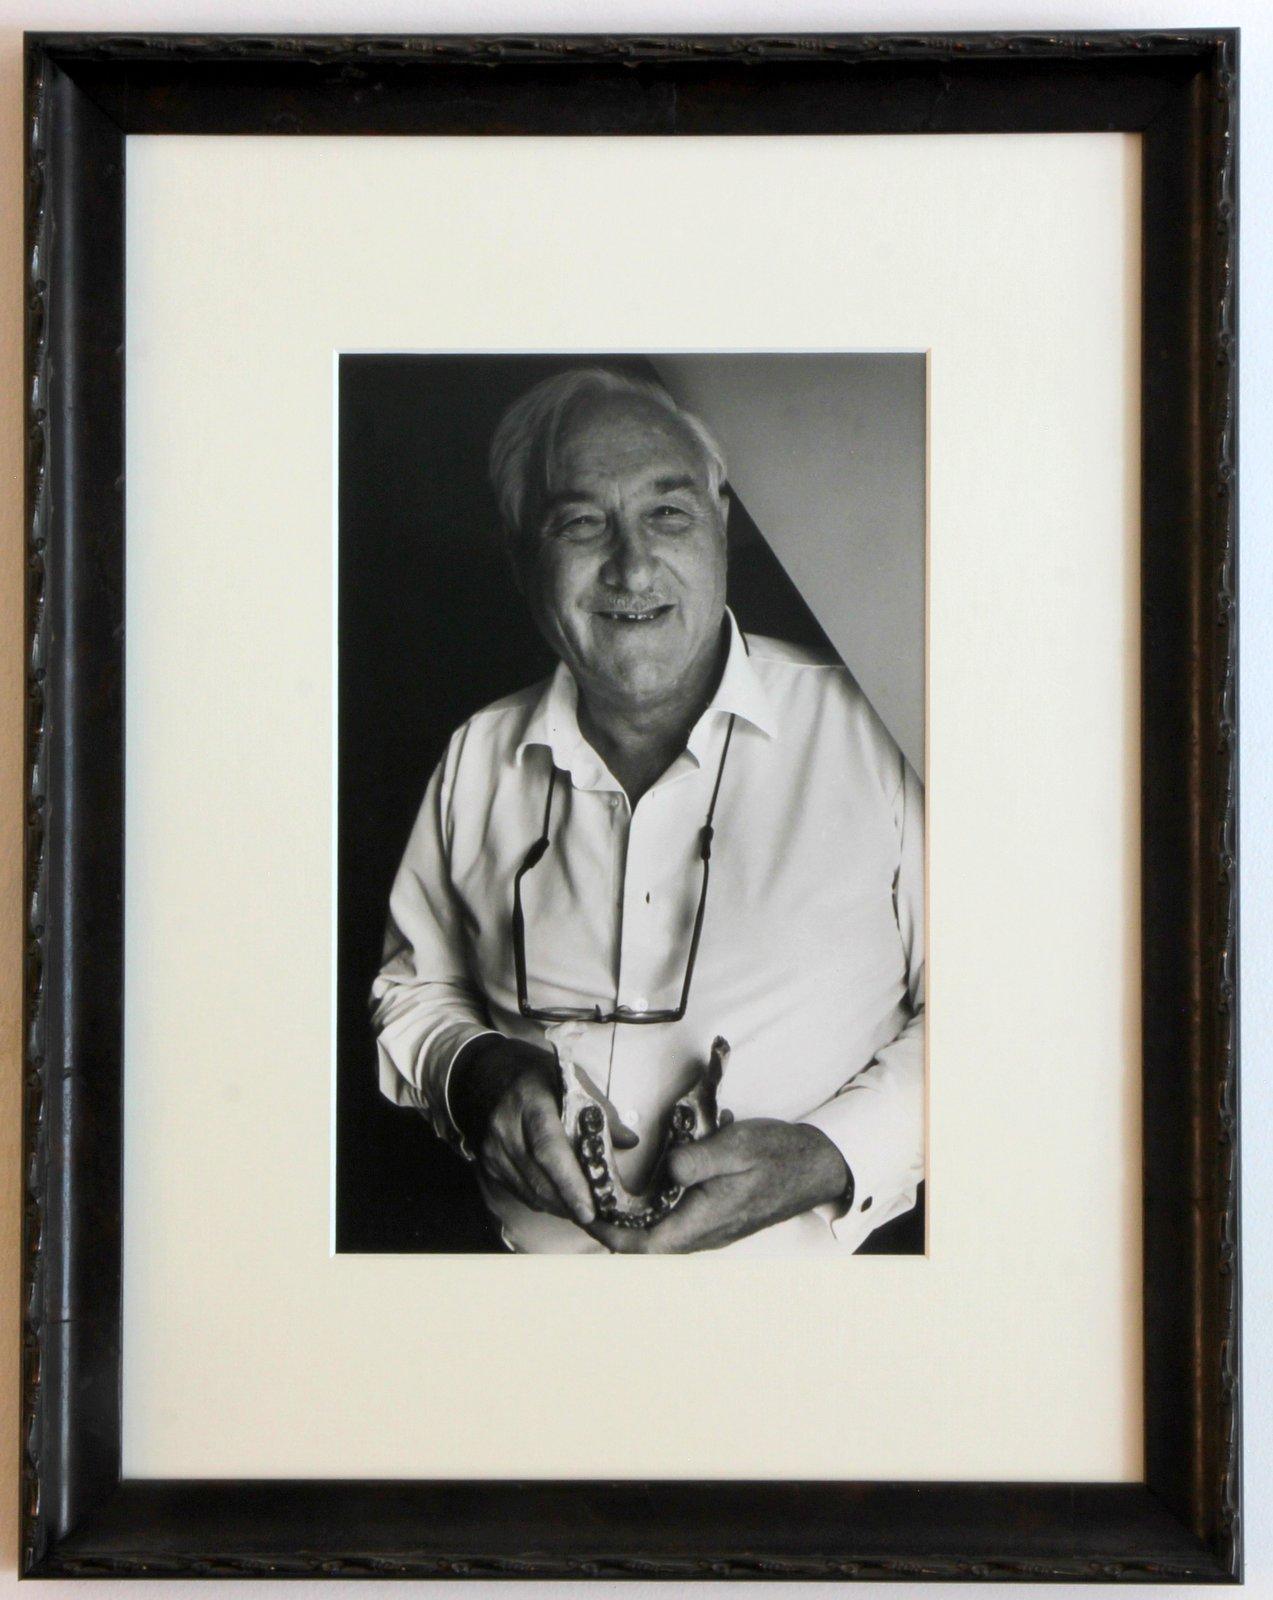 Salt Water New England: Framing Black and White Photographs